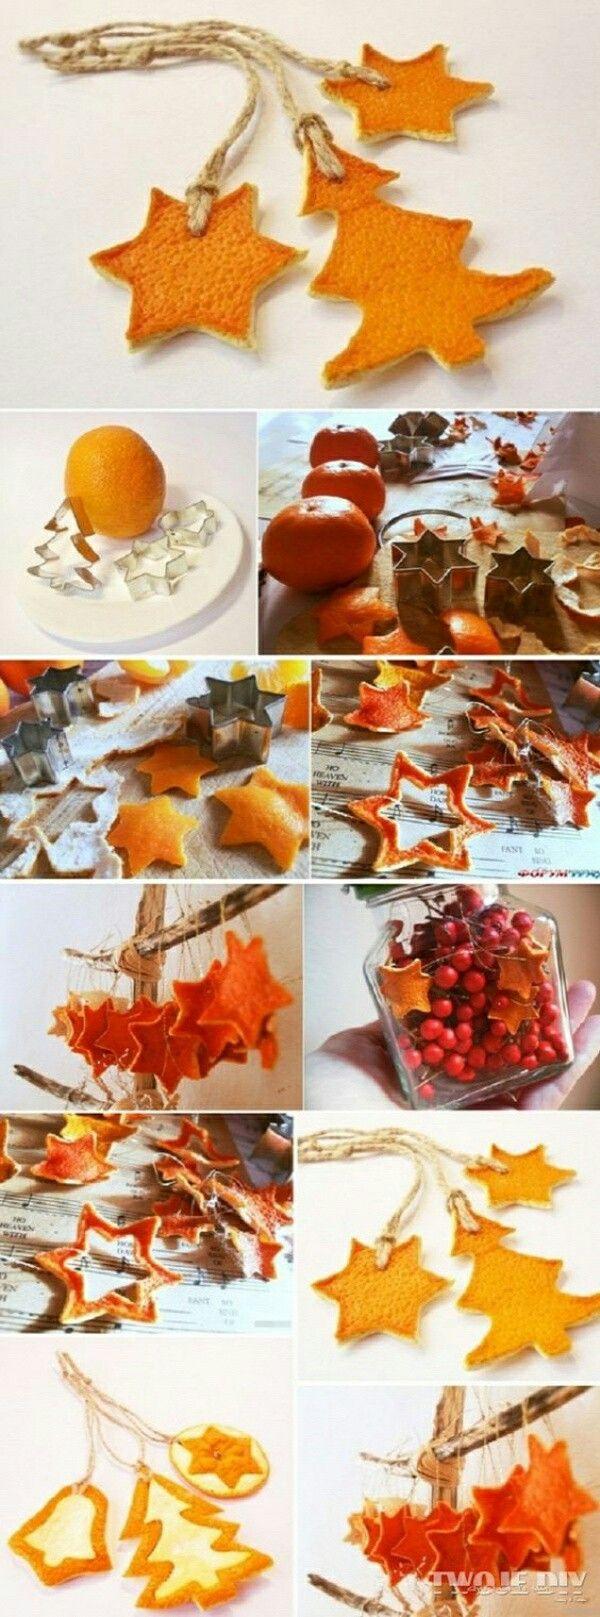 Buccia mandarino